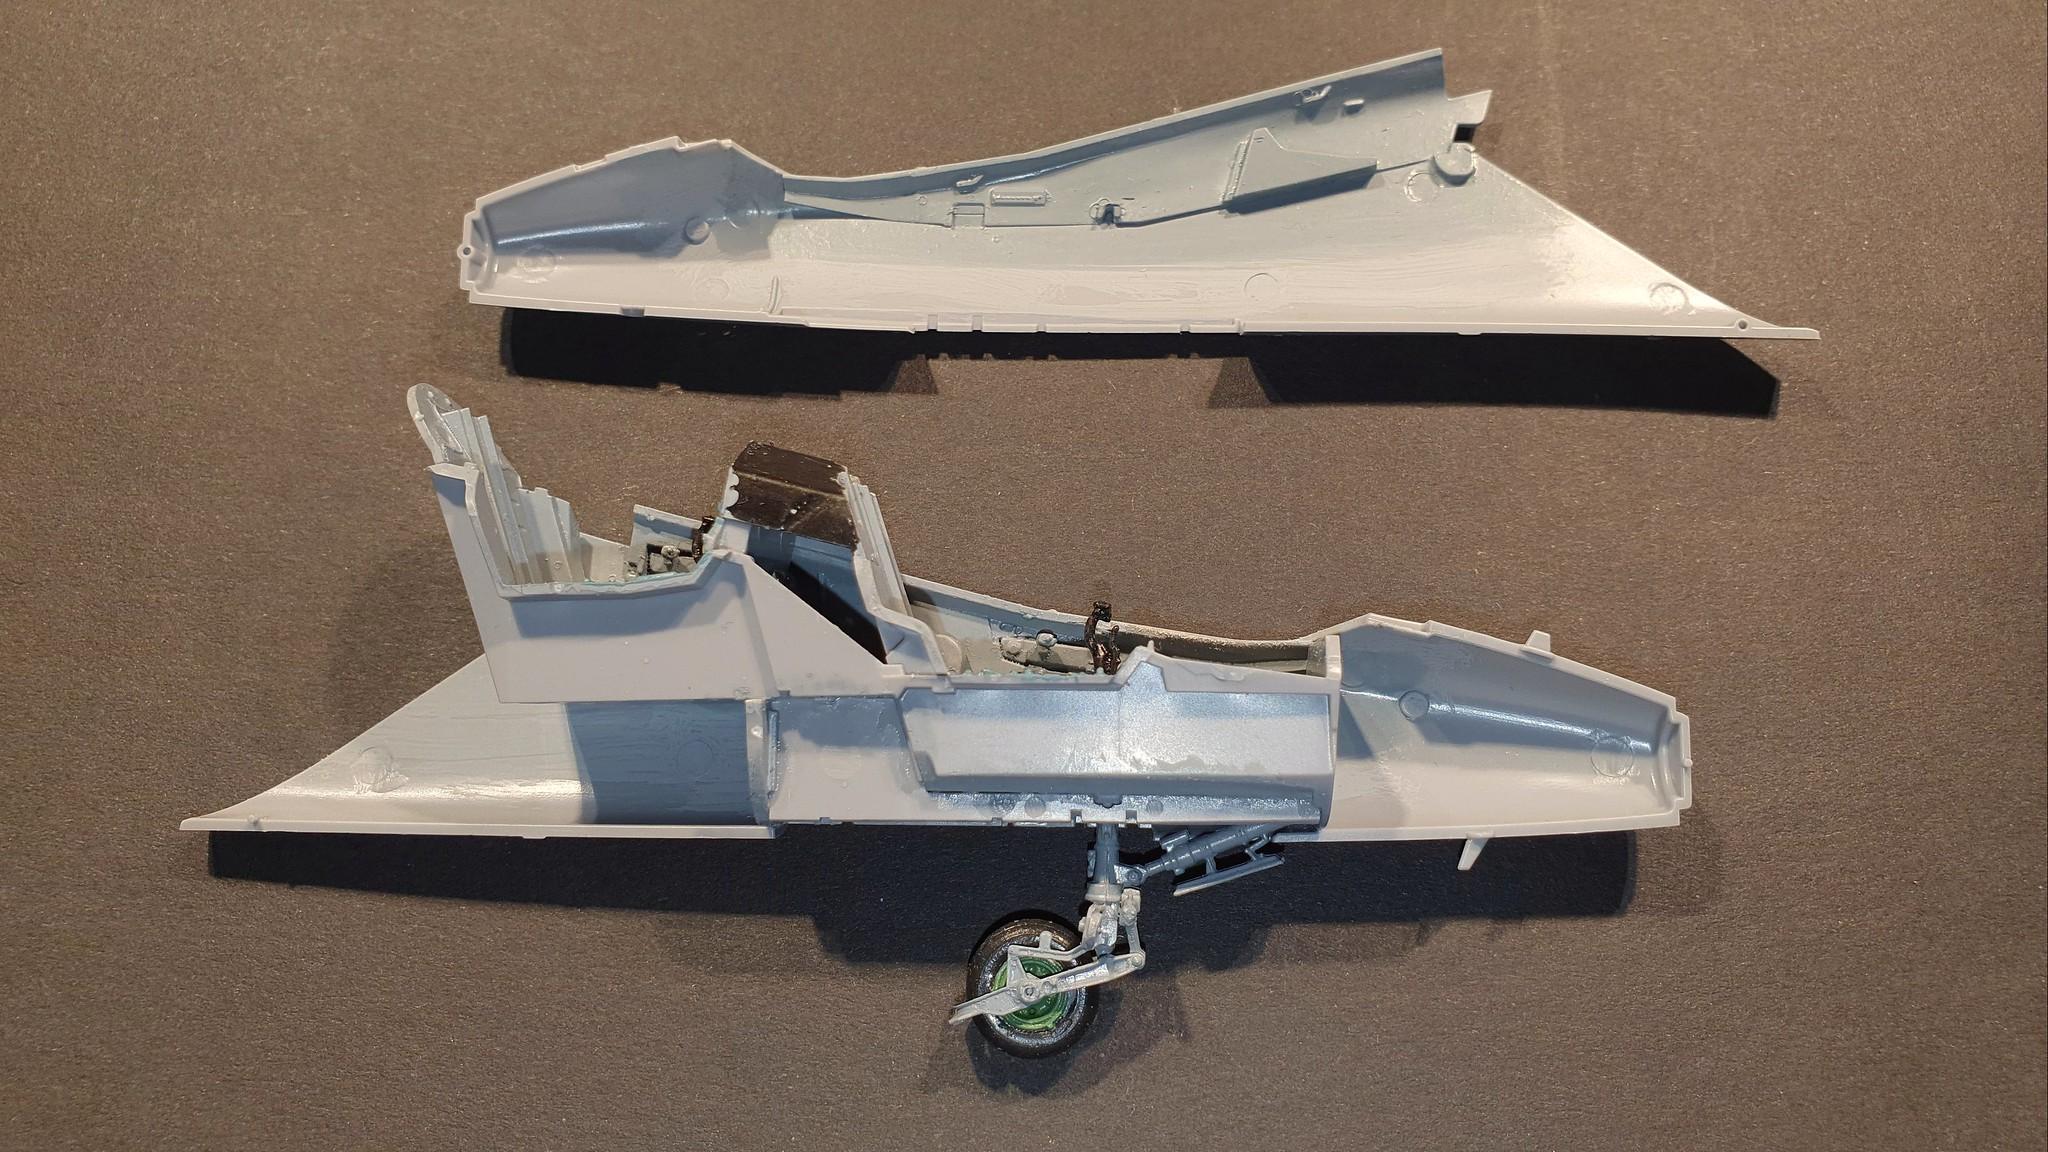 Numera två par tumvantar - Yak-130 Mitten - Zvezda 1/48 - Sida 10 49223613651_9daa8b8b34_k